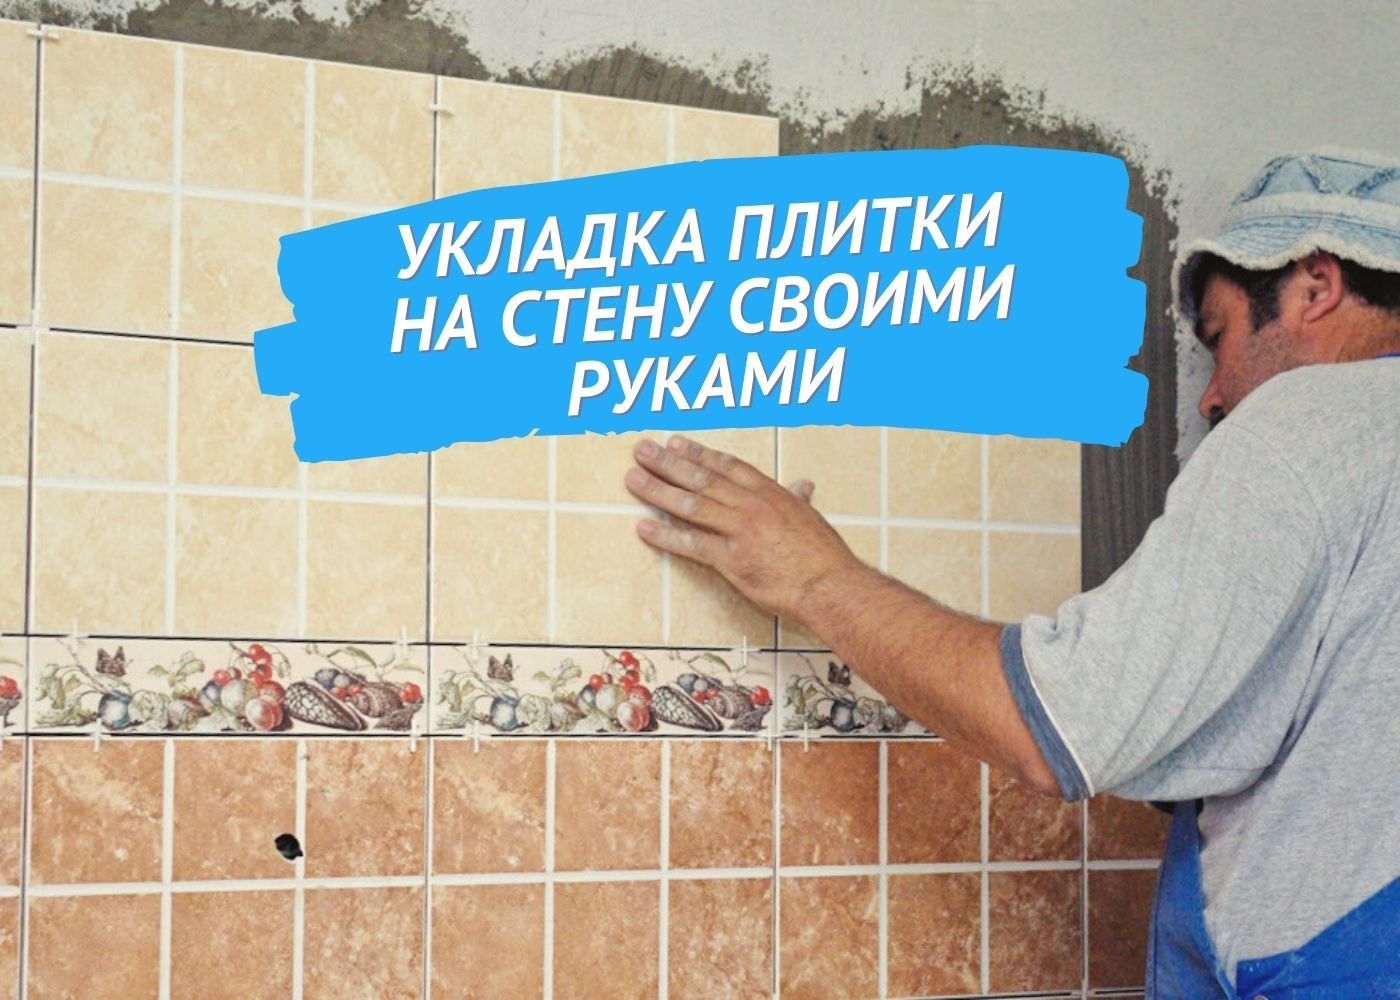 Укладка плитки на стену своими руками.